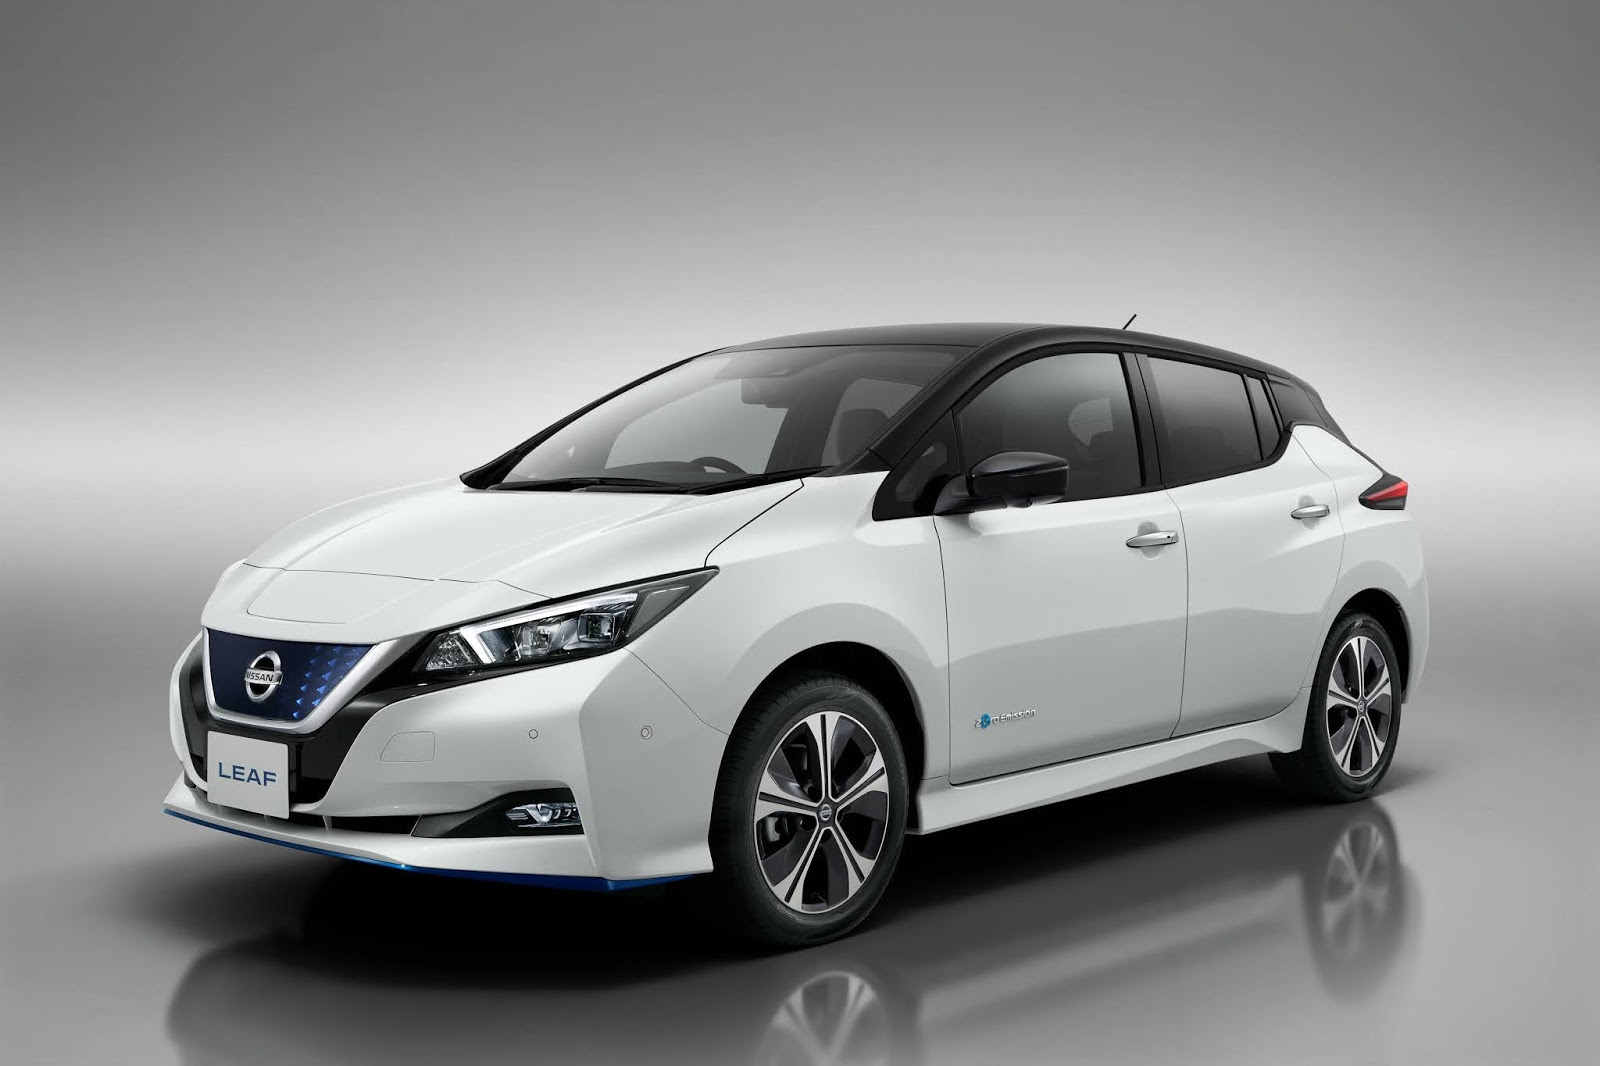 To Nissan Leaf συμπληρώνει μία δεκαετία εξέλιξης